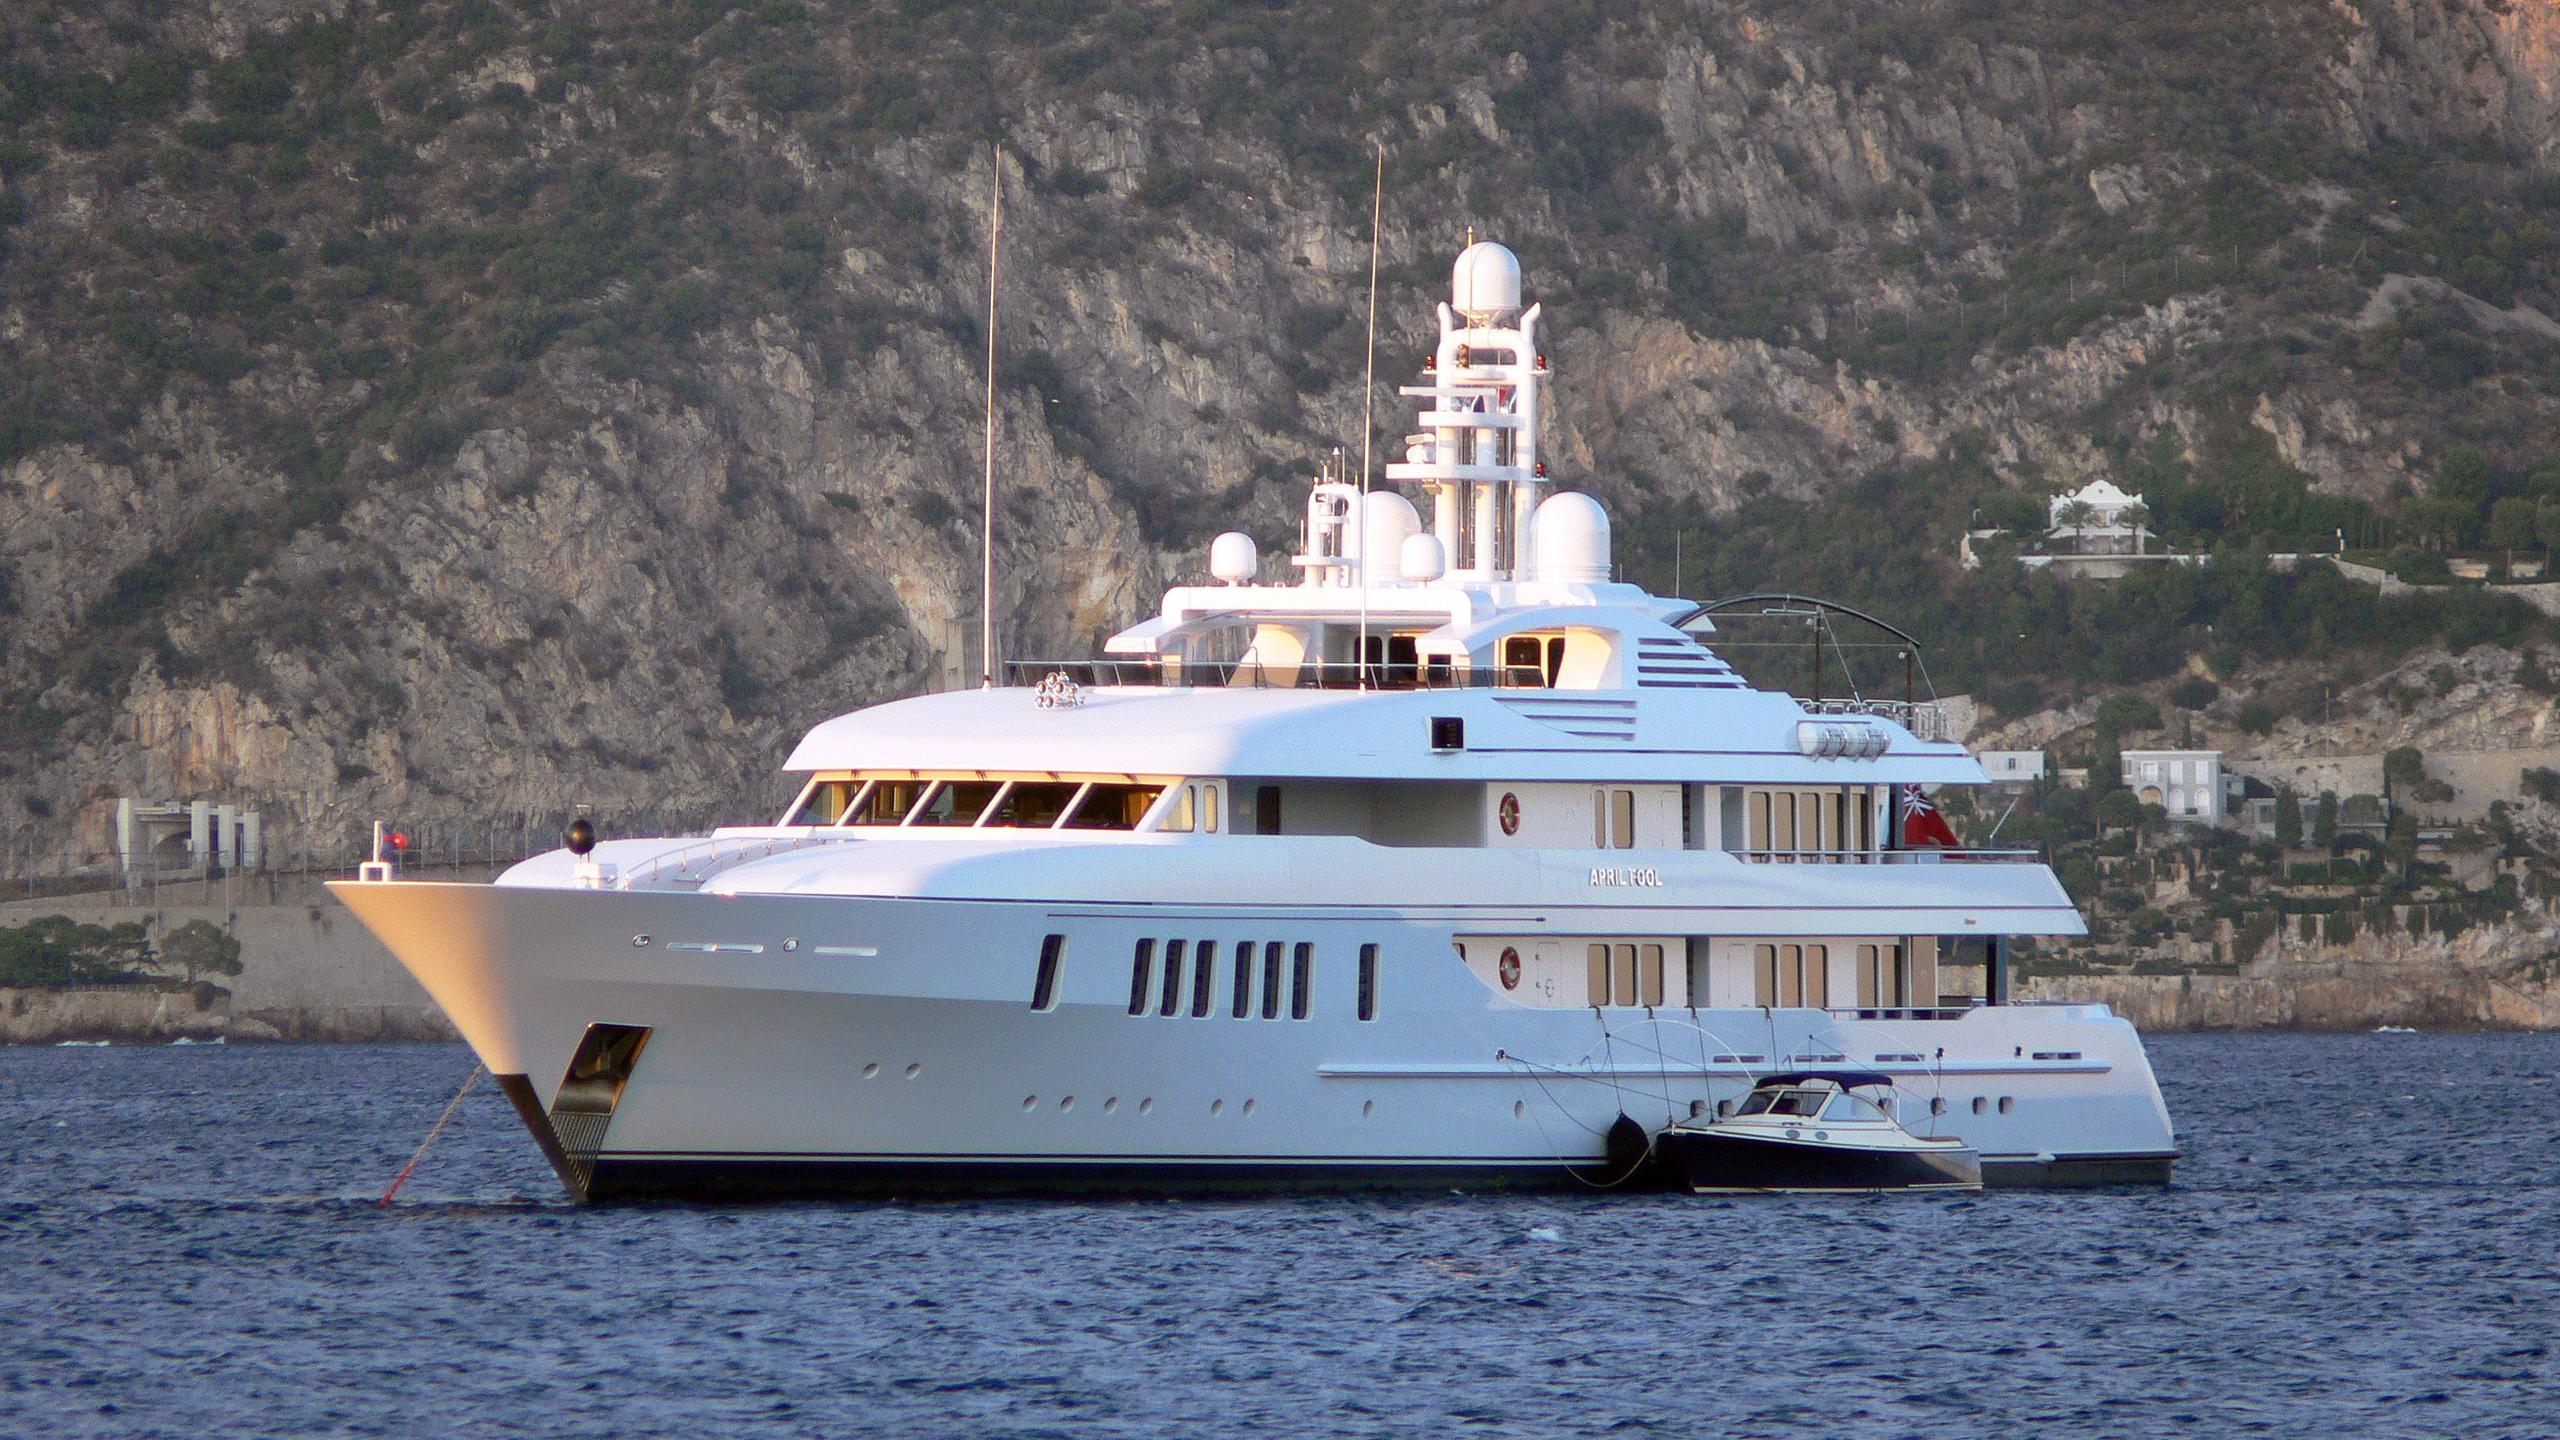 samadhi-motor-yacht-feadship-2006-61m-half-profile